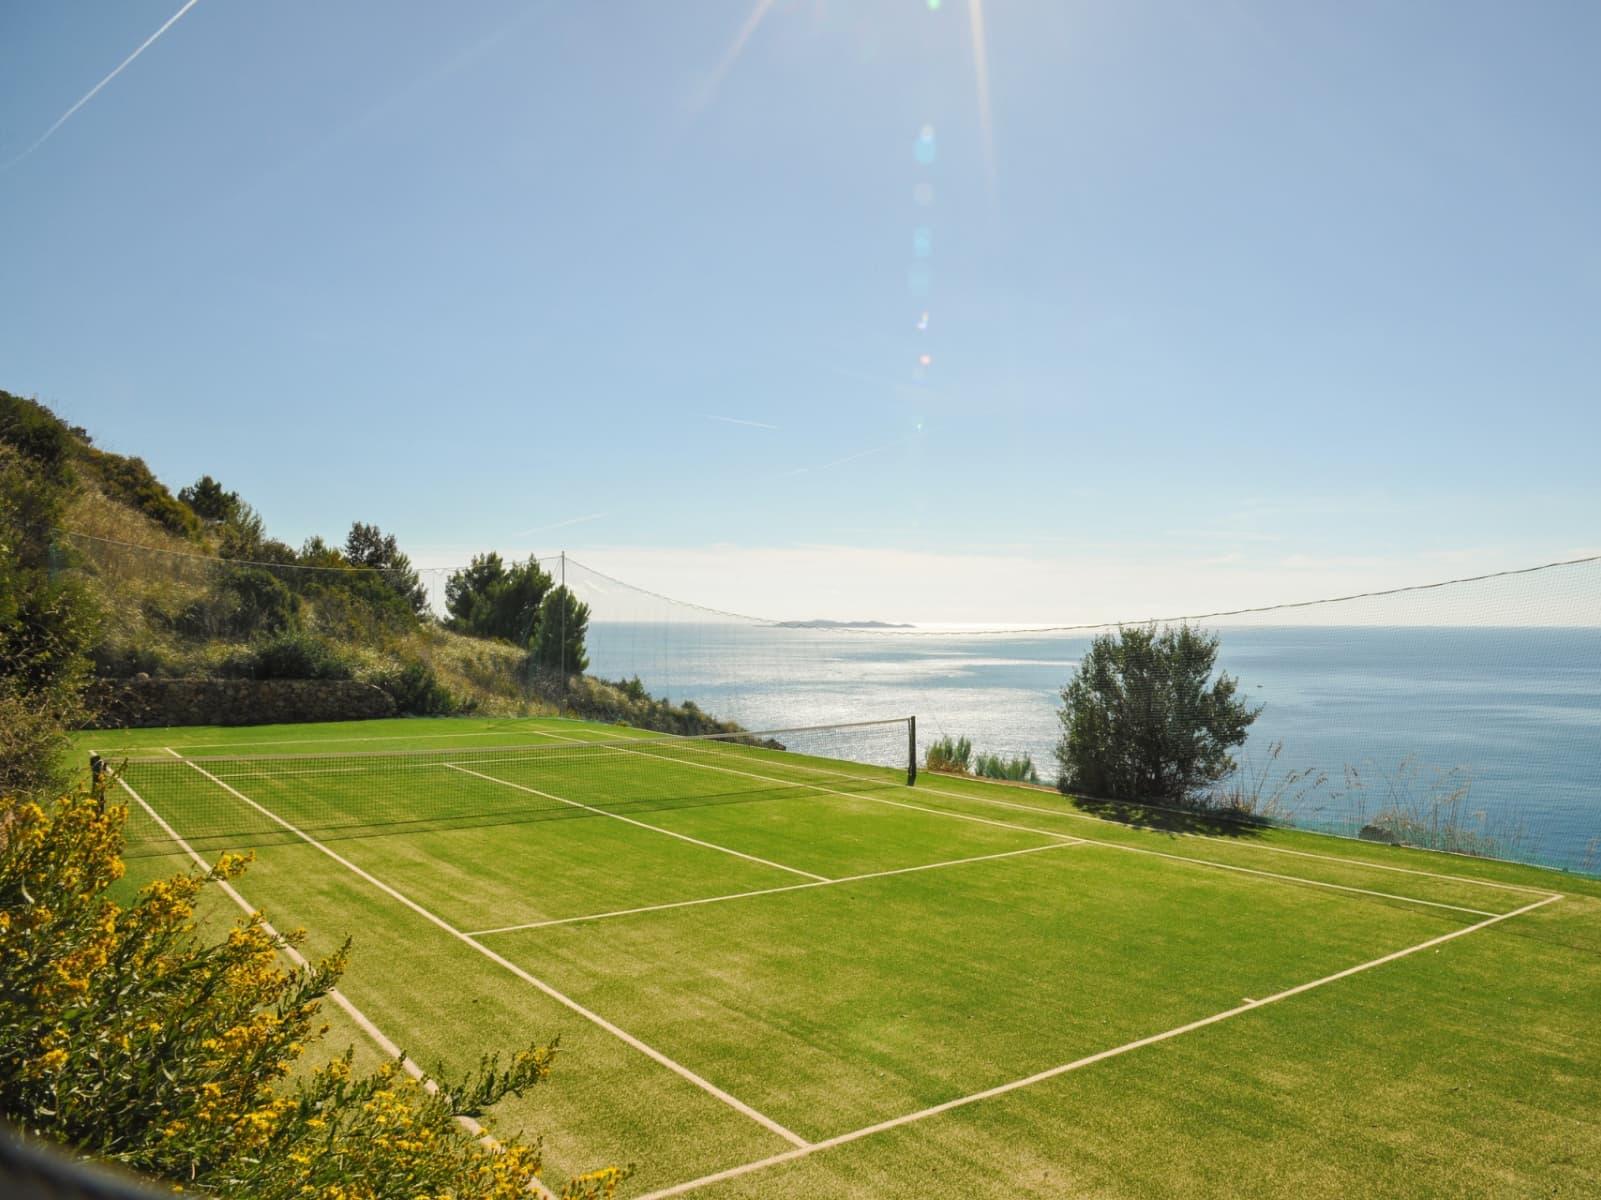 Tennis villa in Tuscany, Italy (Spini Bianchi)